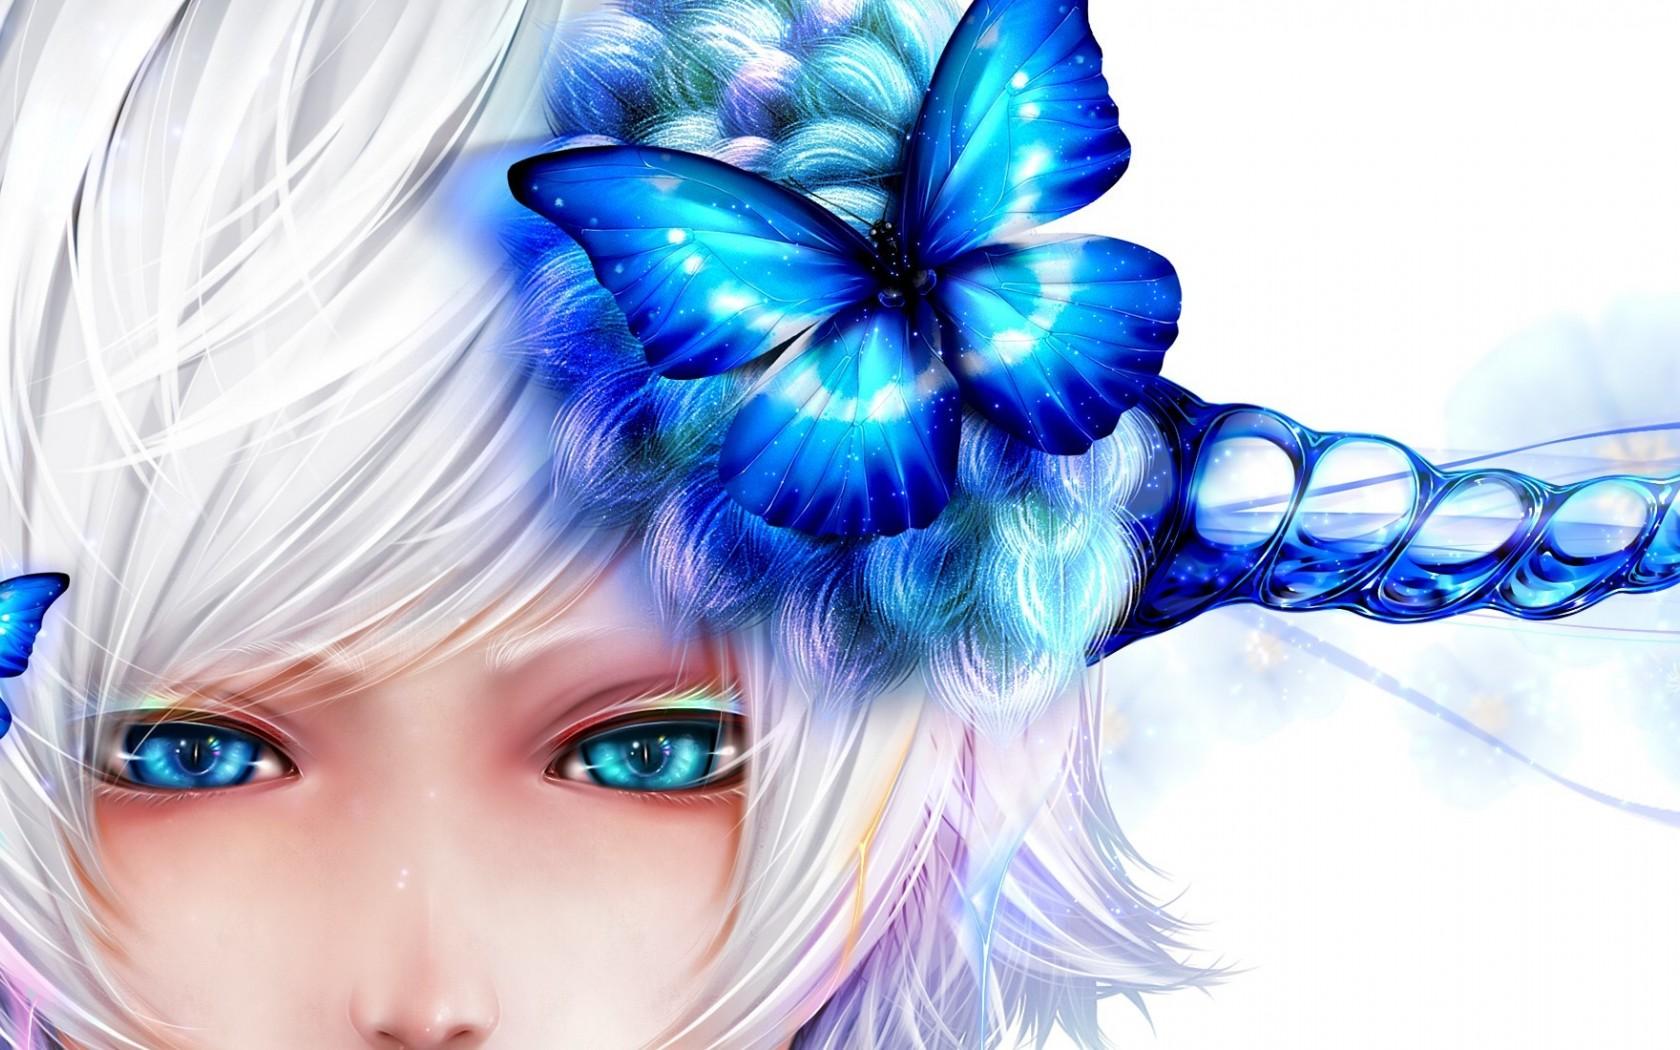 bouno satoshi, butterfly, girl Wallpaper, HD Anime 4K ...